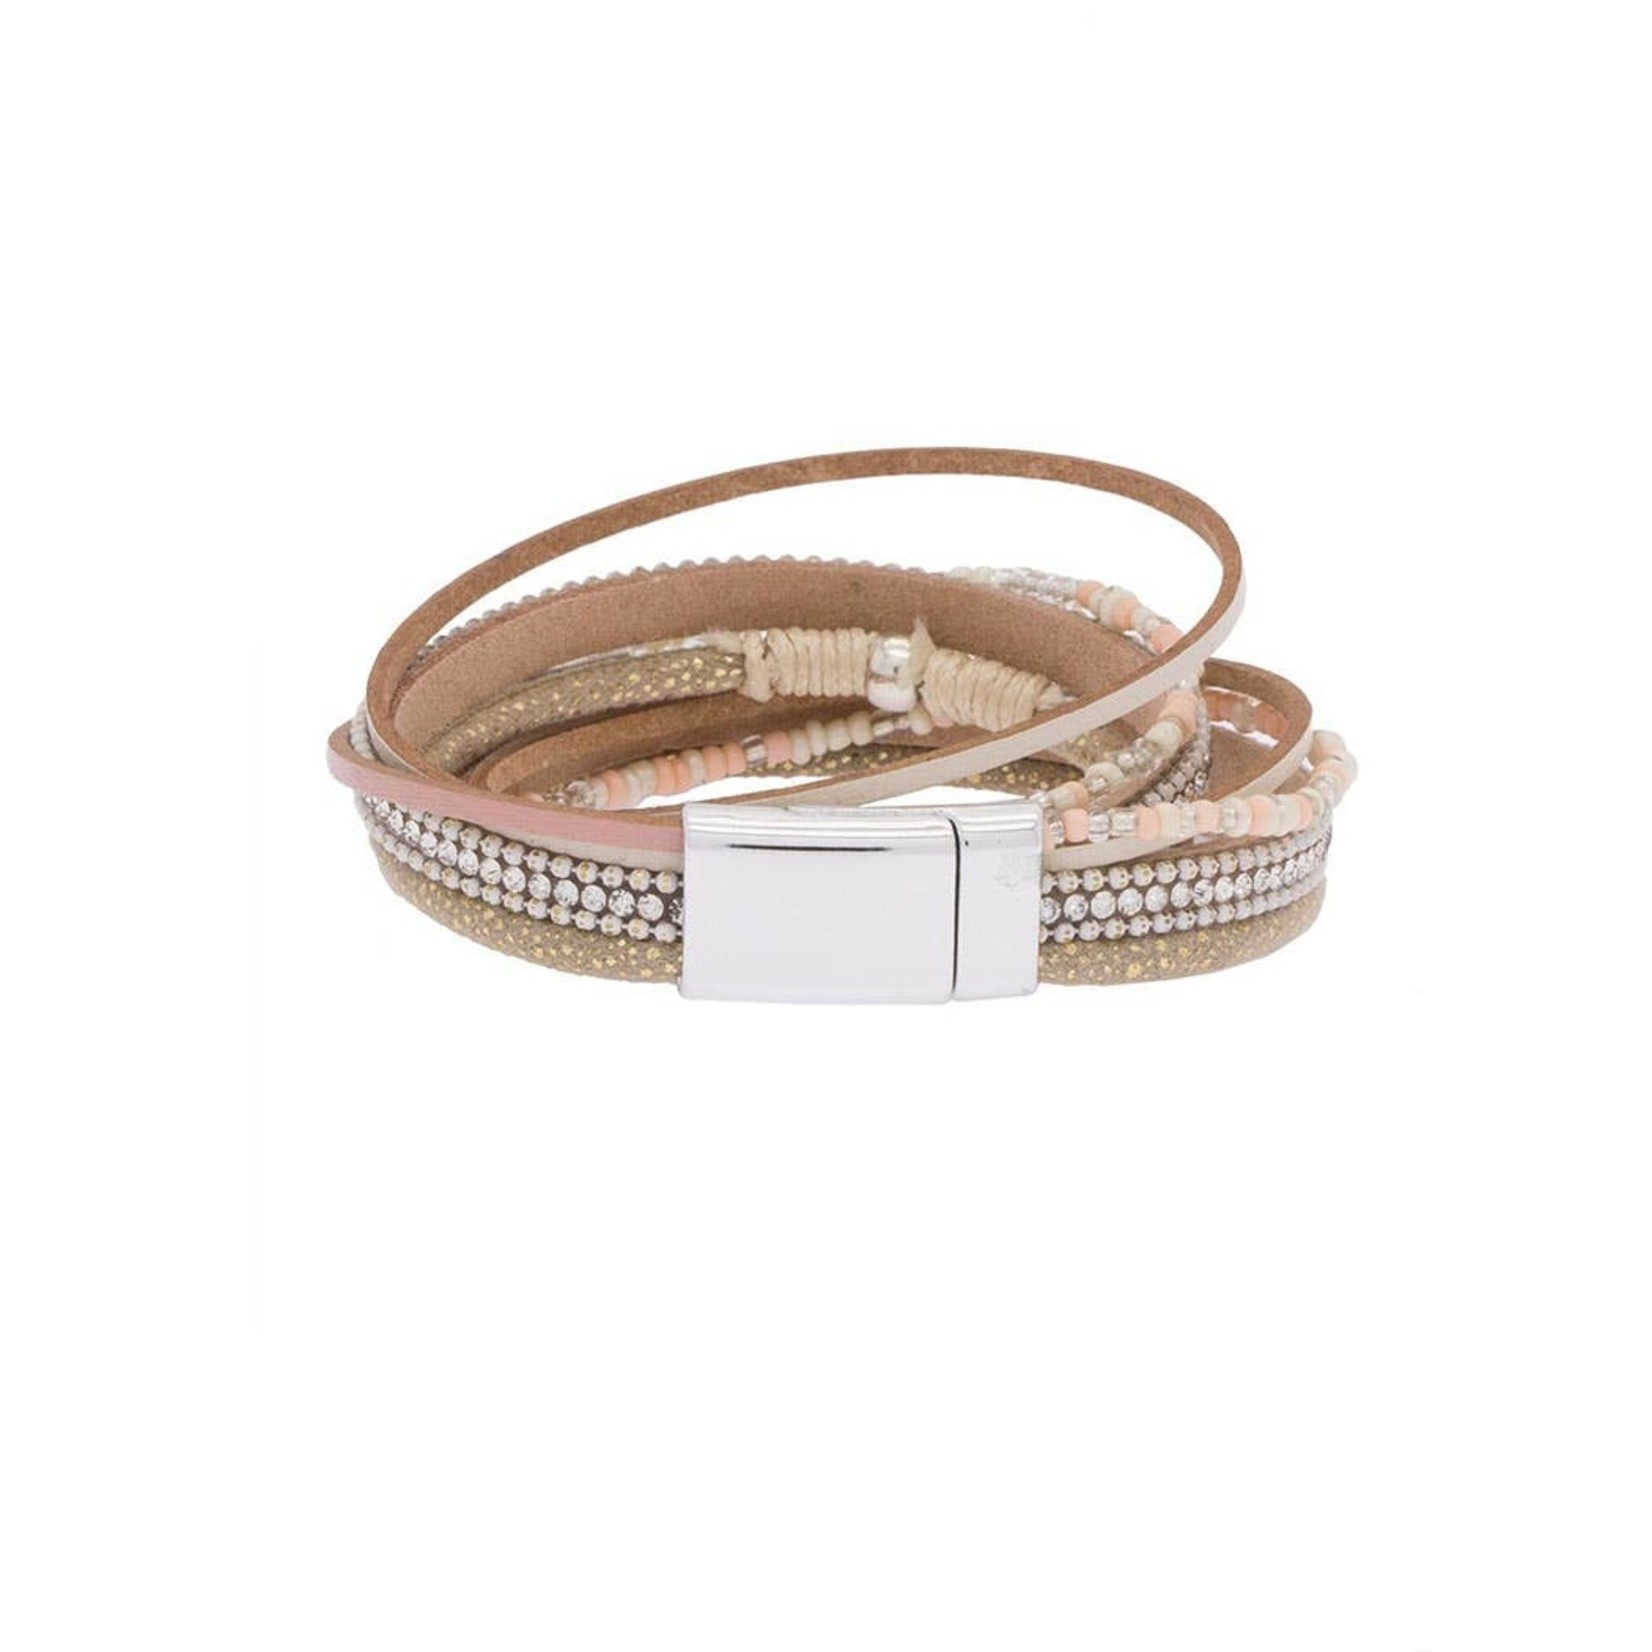 Sacramento Faux Leather Bracelet In Tan